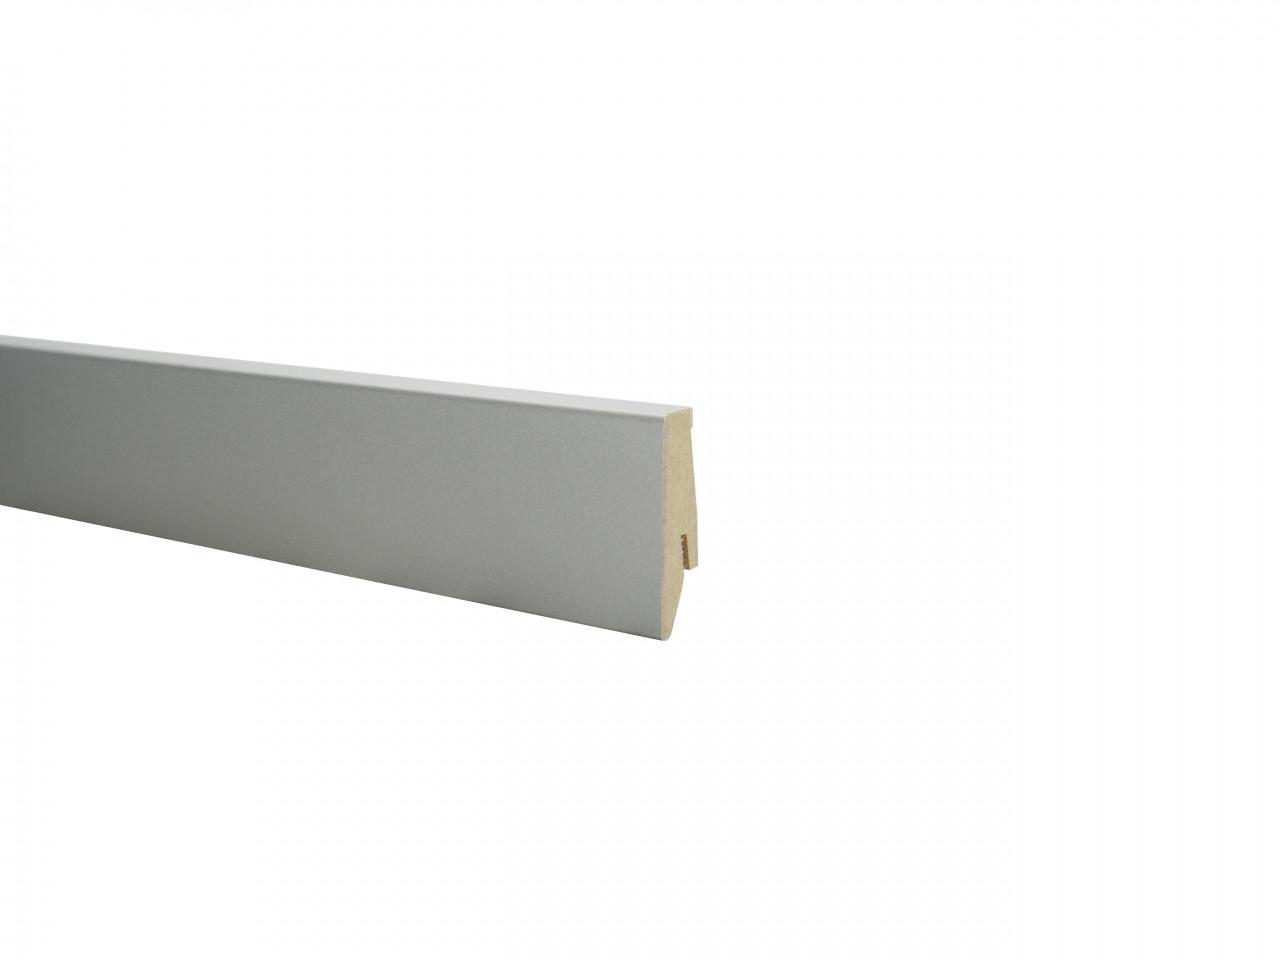 9071 Silver MDF Skirting Board K58C